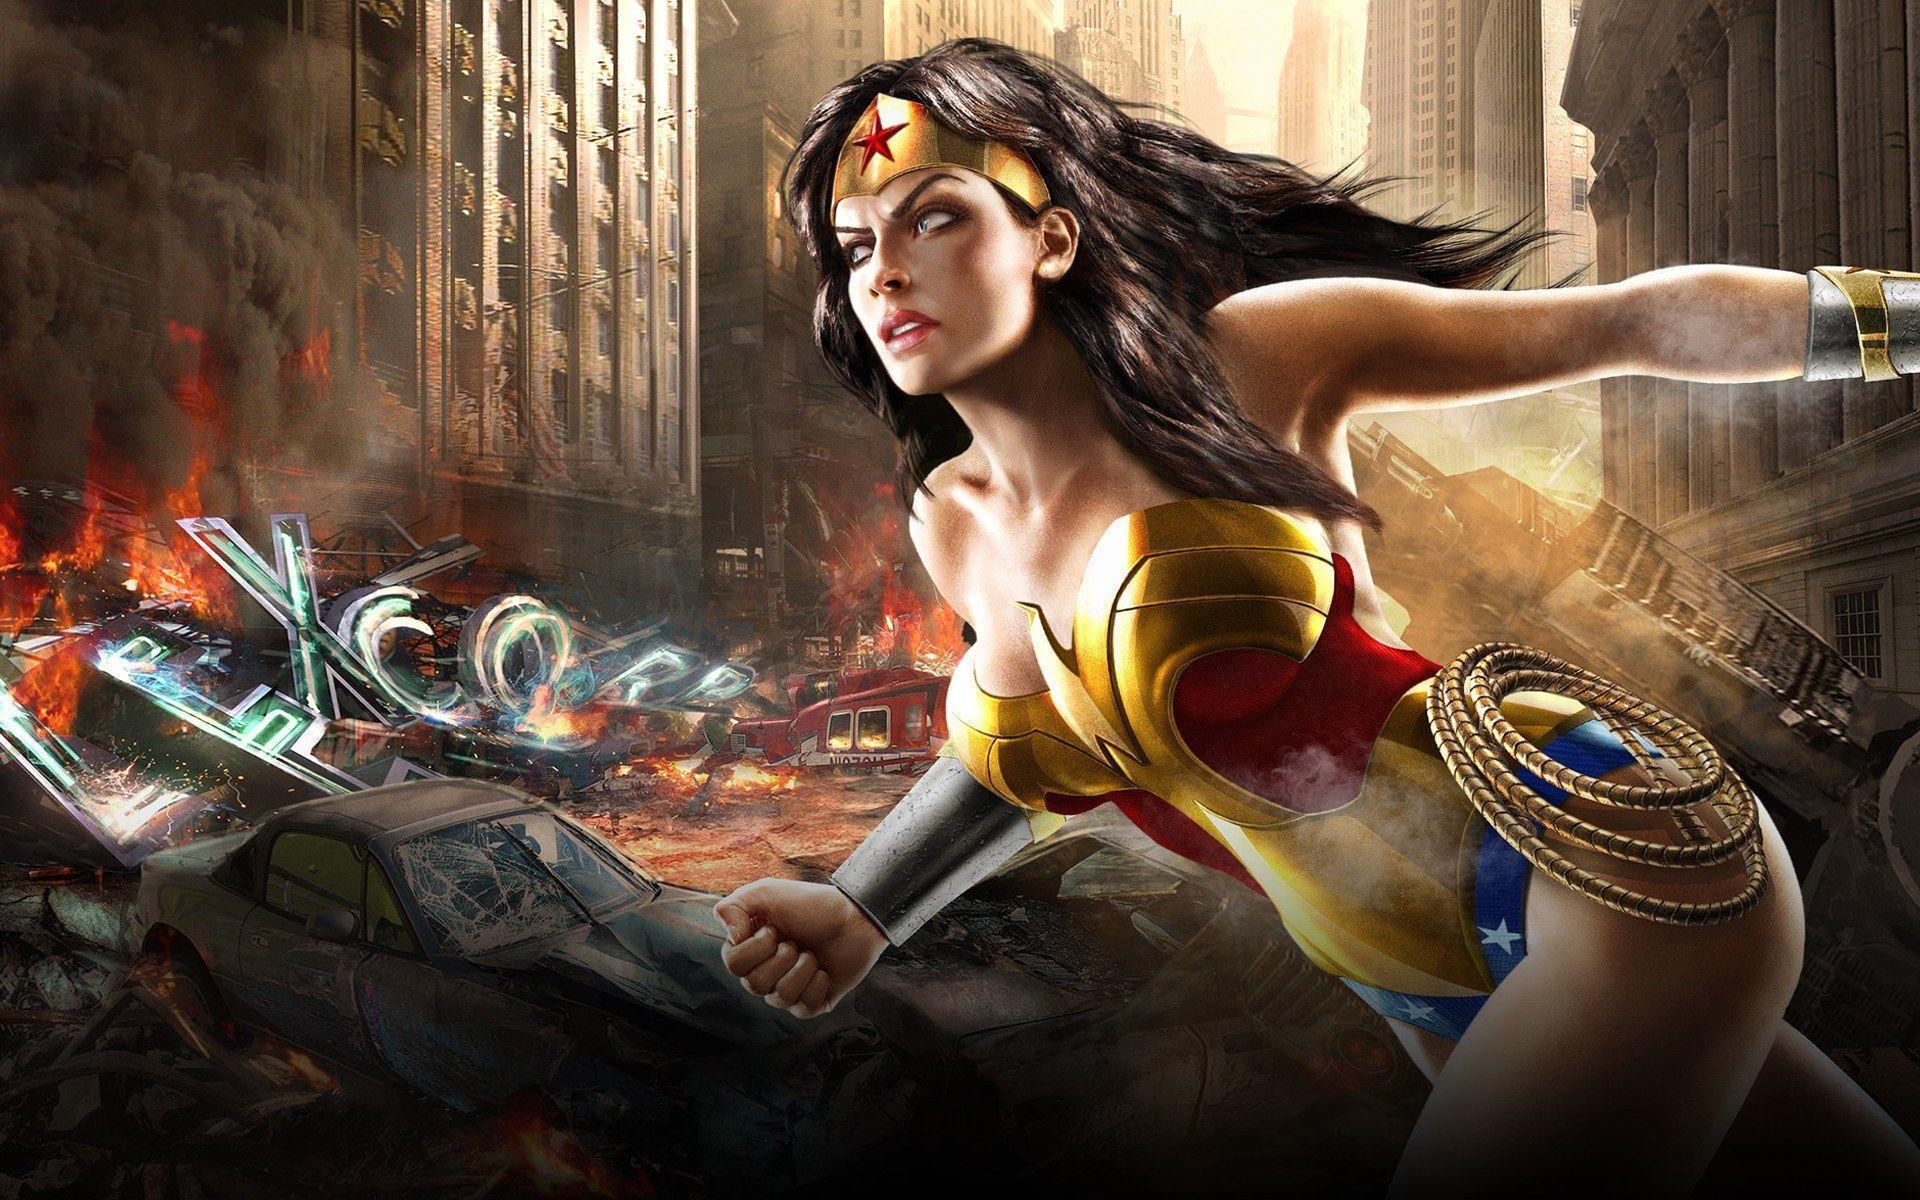 Wonder Woman Wallpaper Collection (40+)